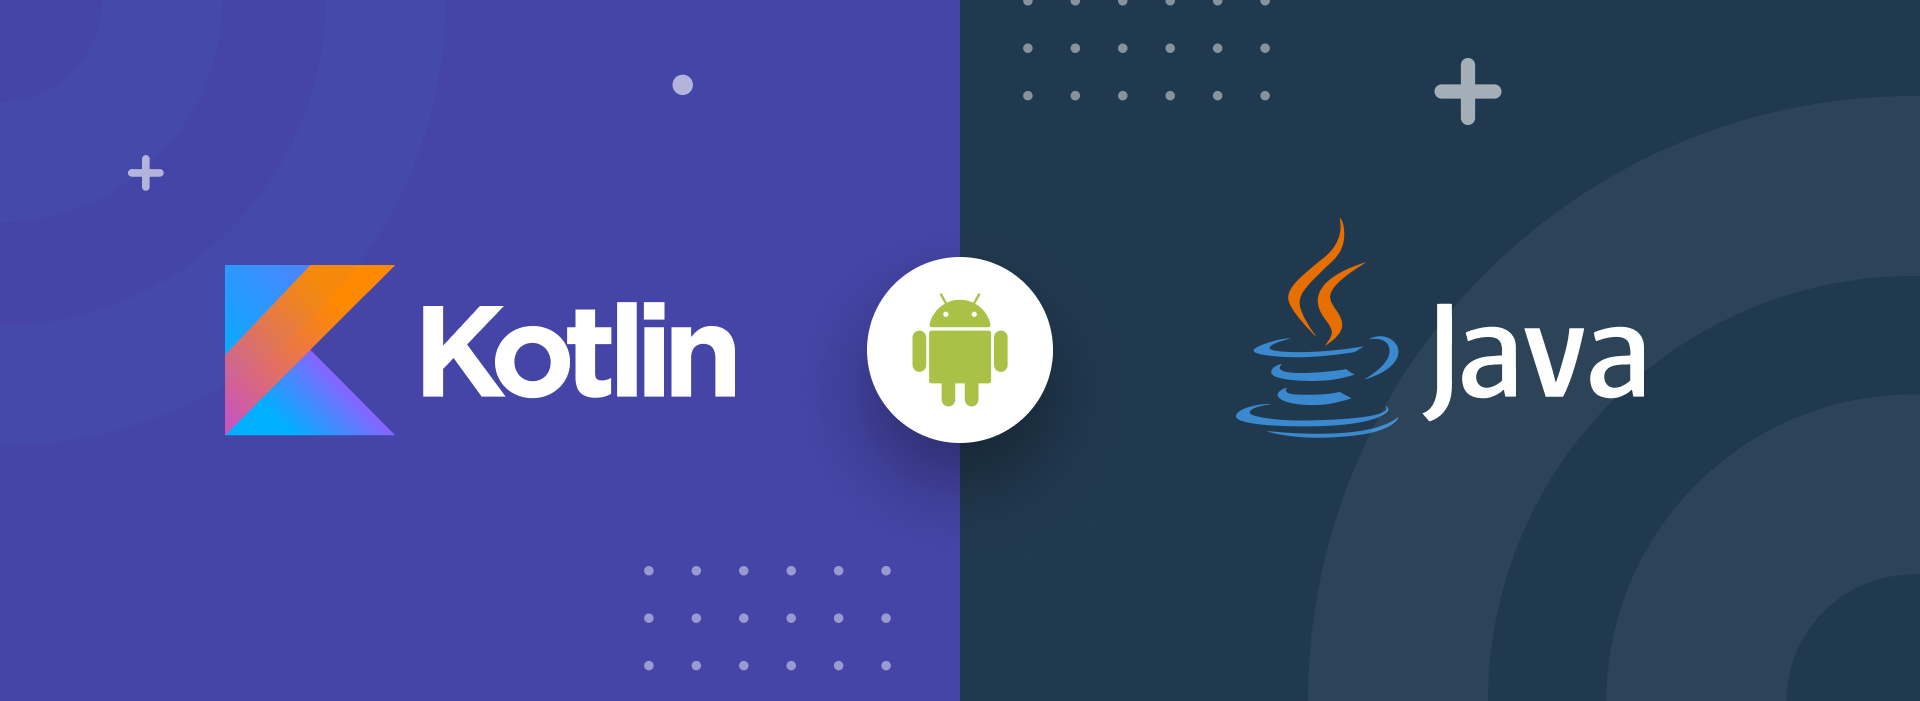 Kotlin vs  Java: How Kotlin Advances Android Development